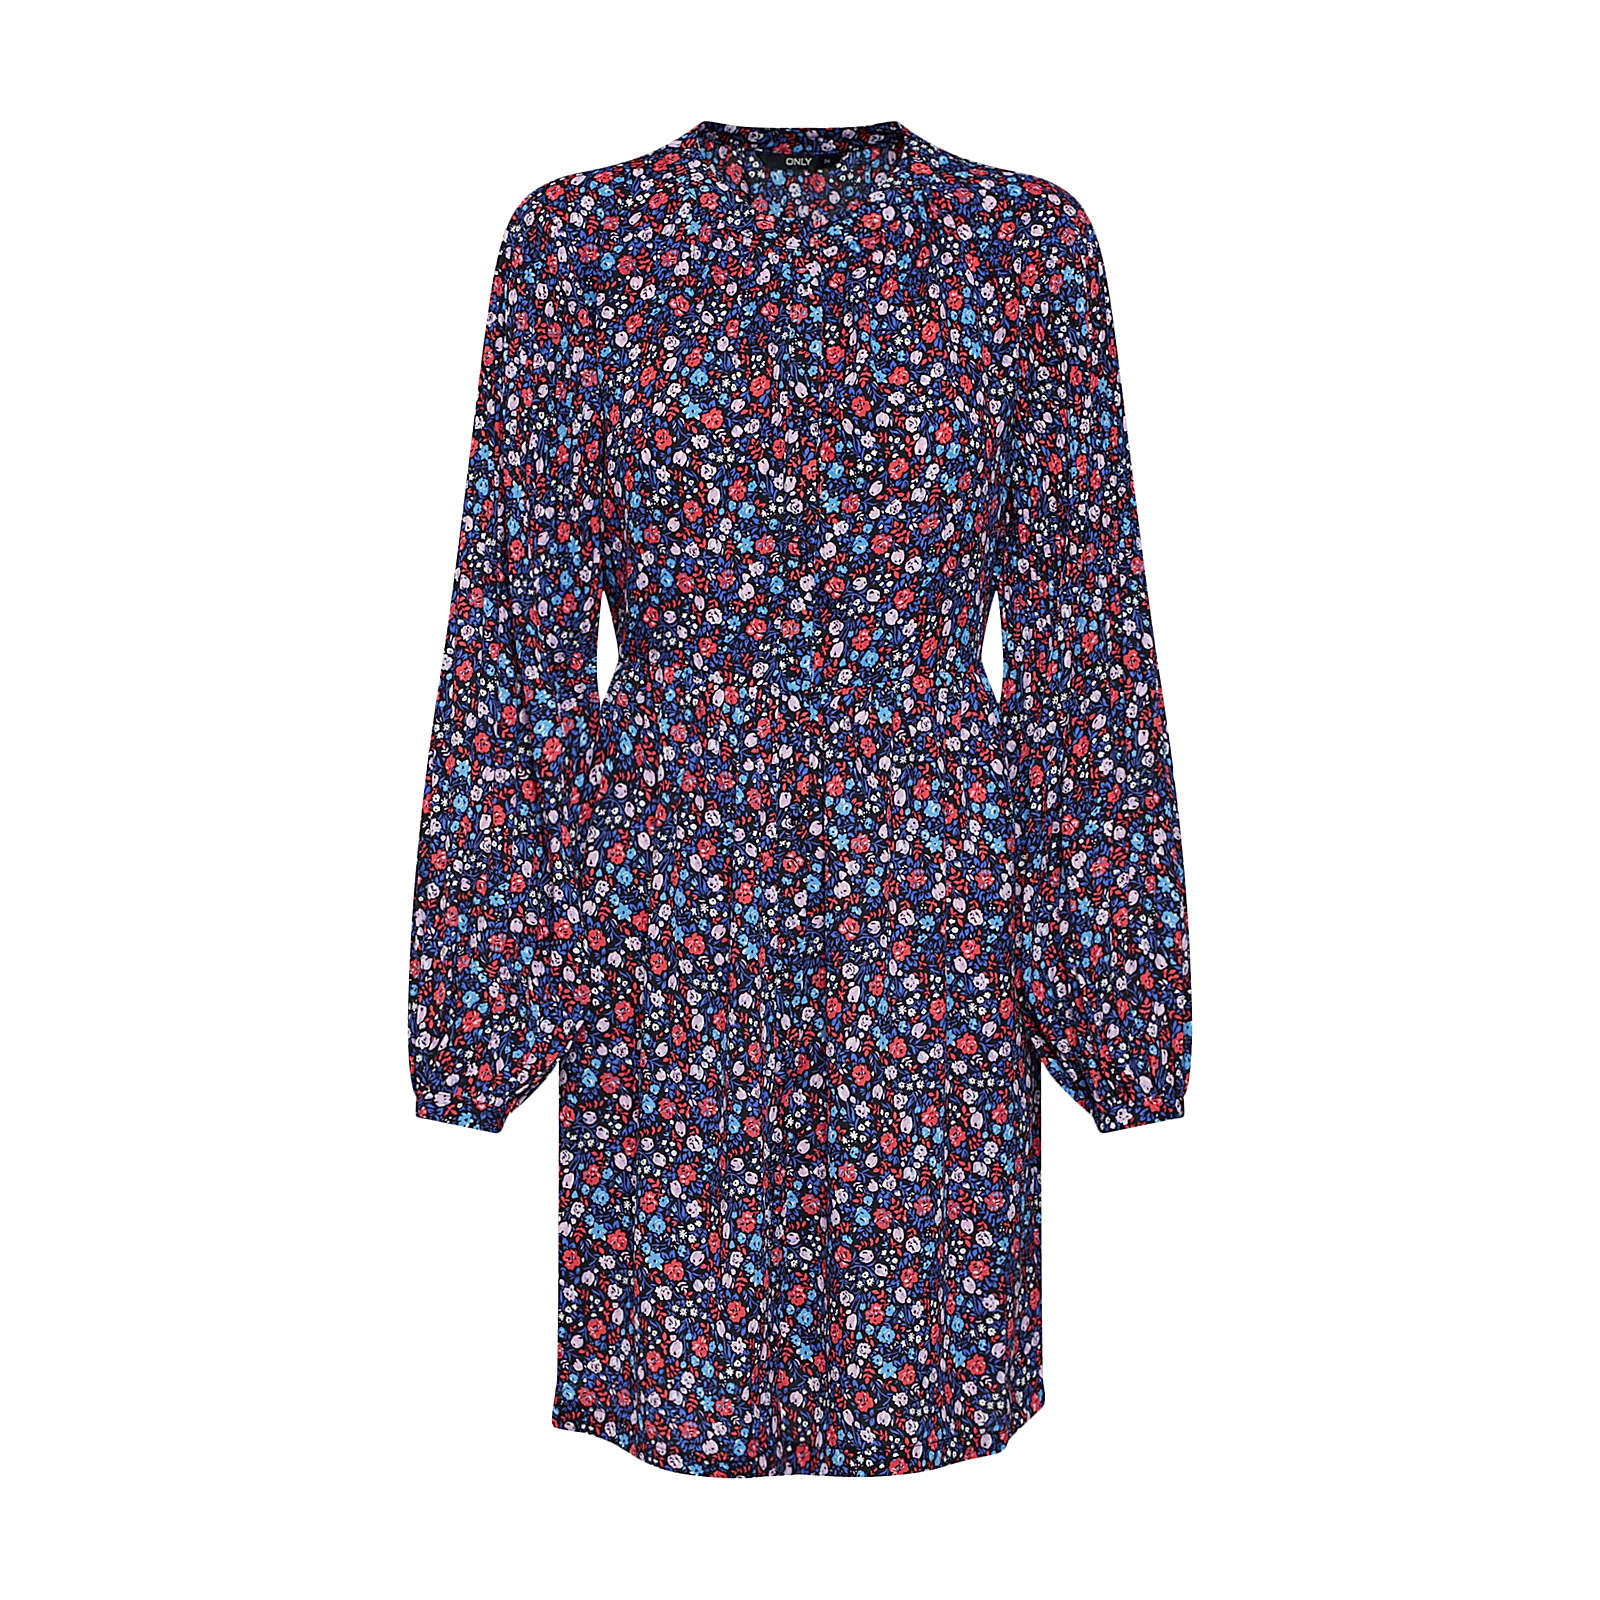 ONLY Blusenkleid PHOEBE Blusenkleider pink Damen Gr. 40